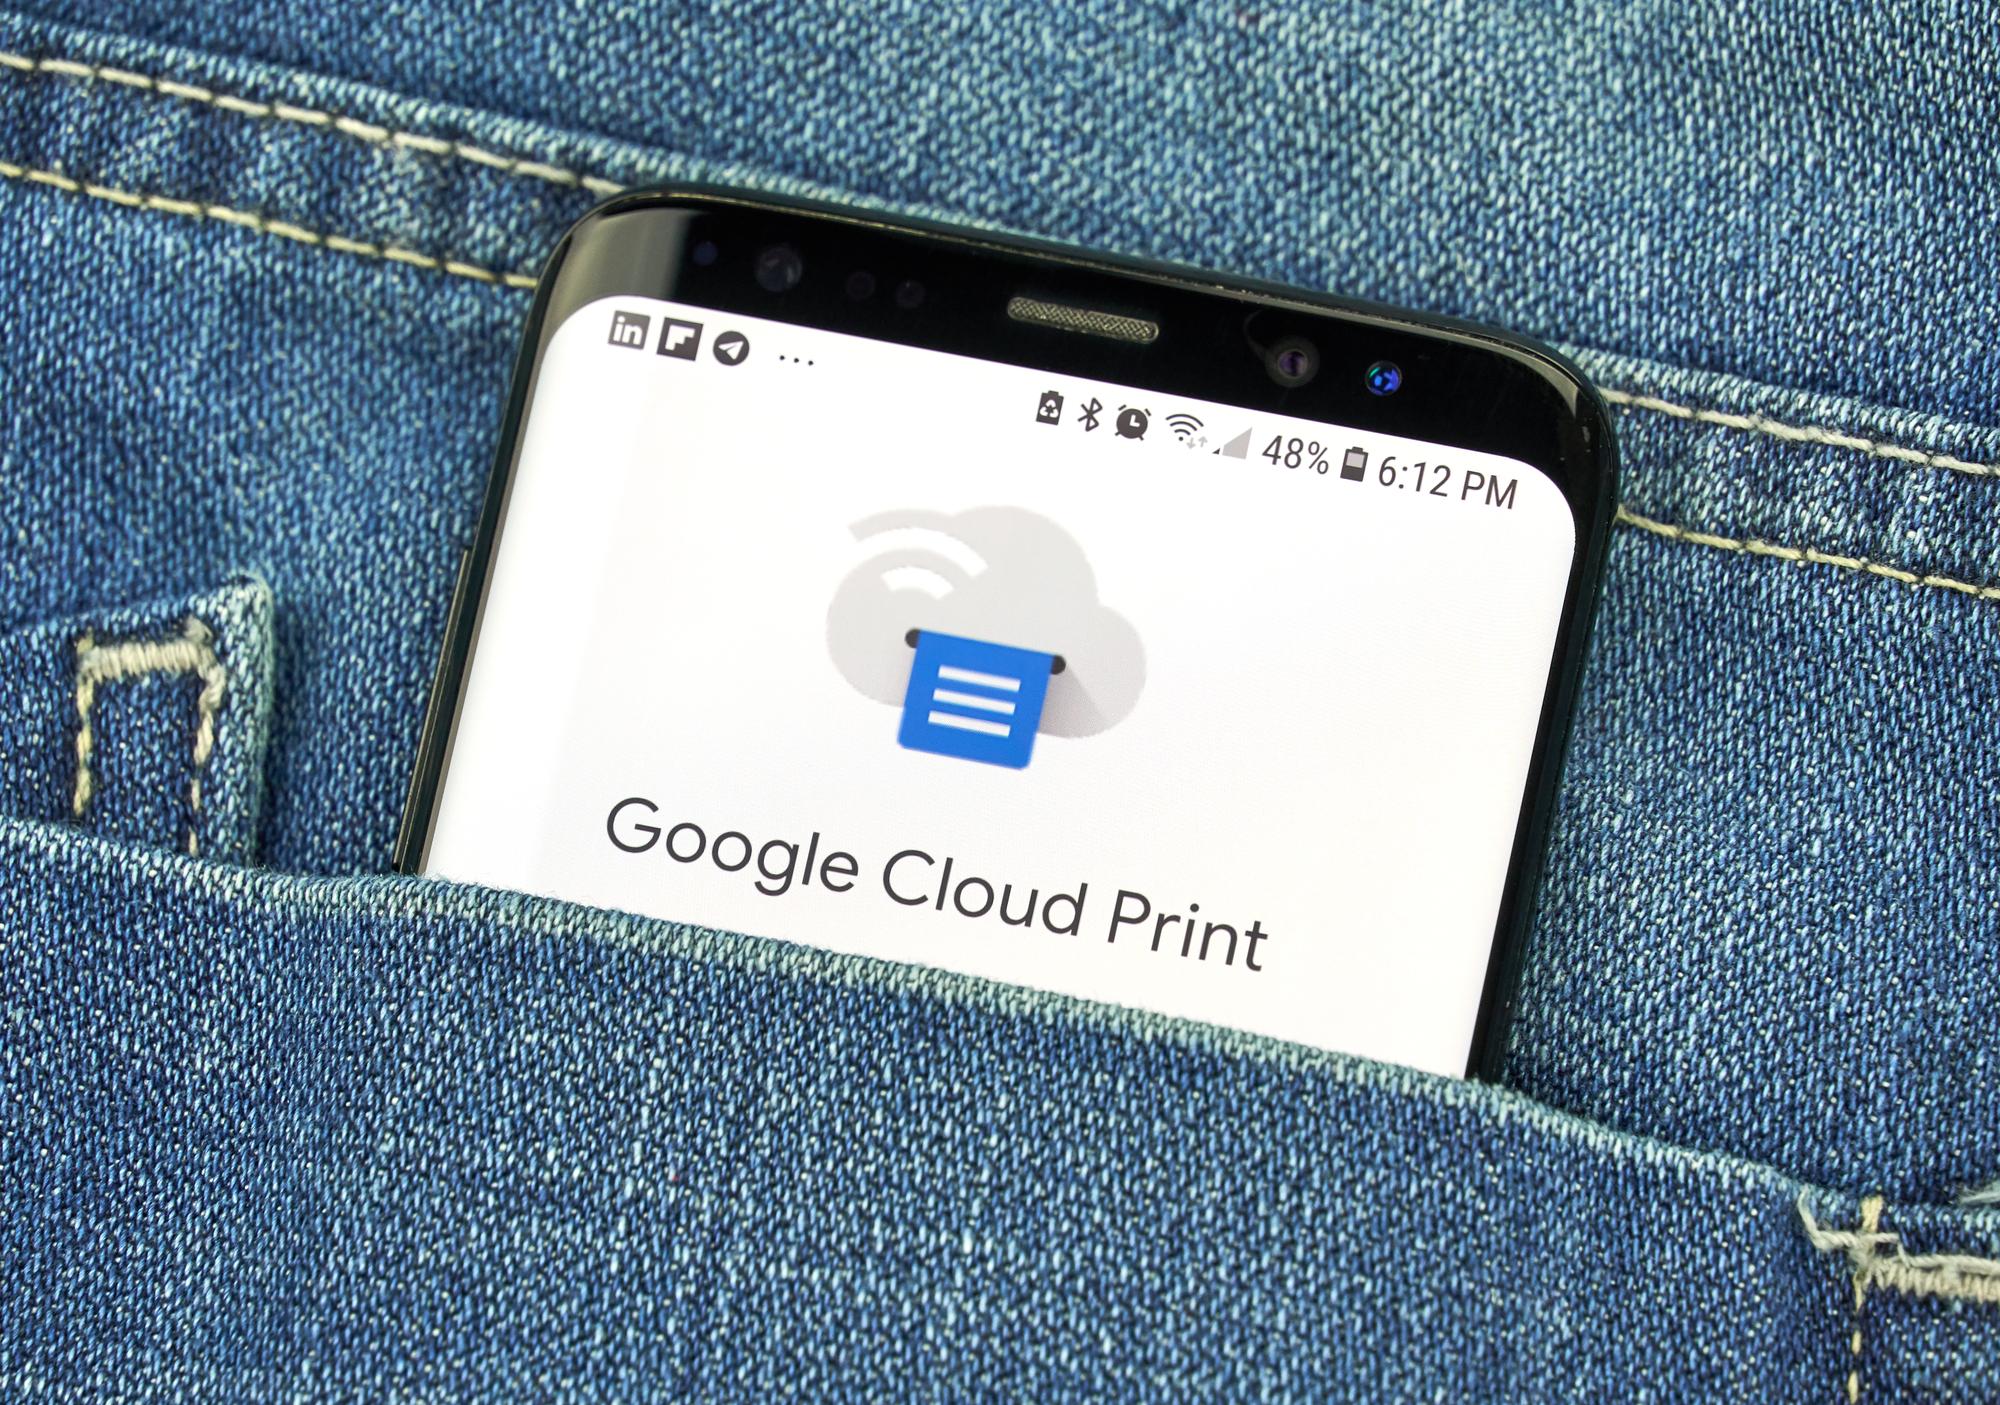 Google's Cloud Print May Be Discontinued